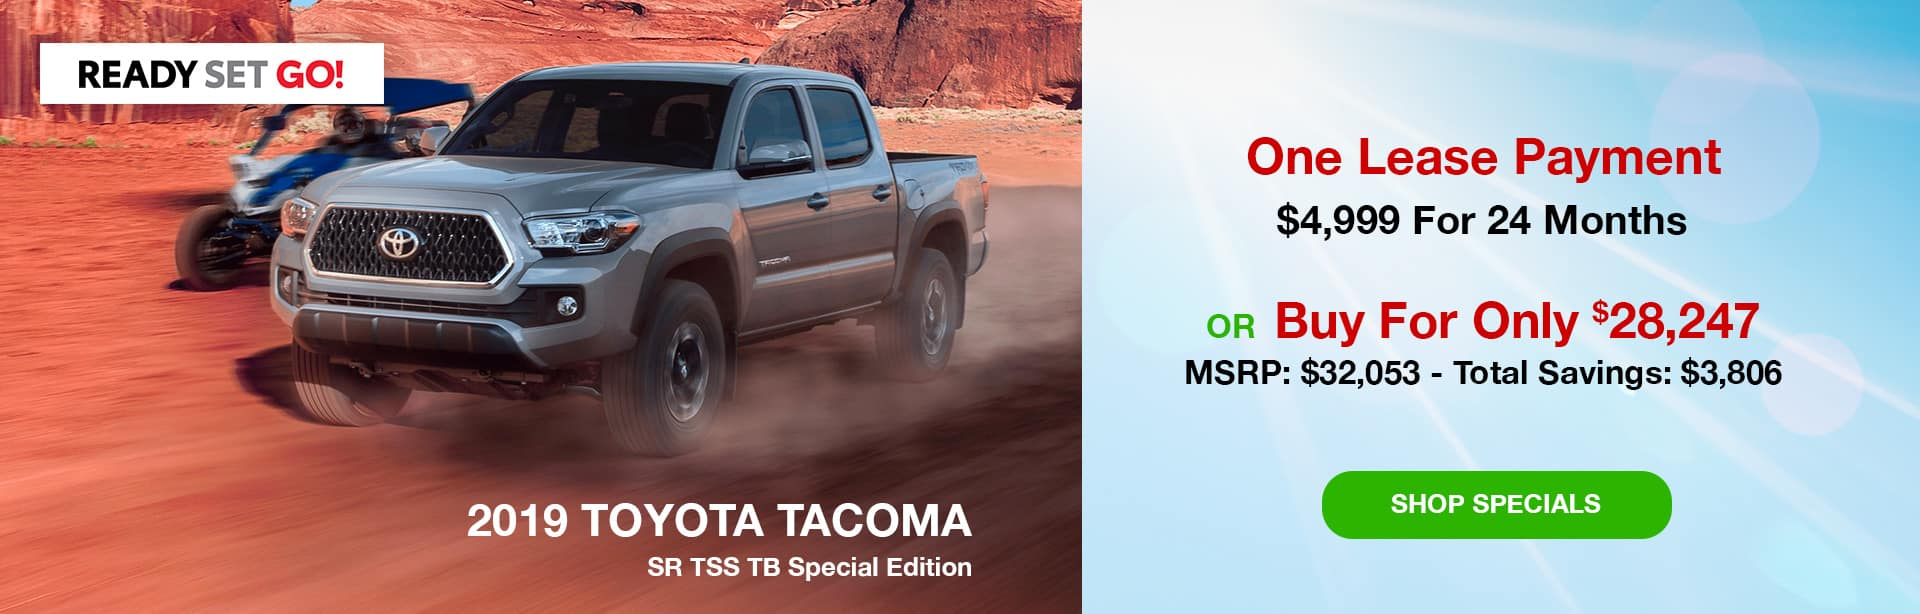 2019 Toyota Tacoma SR TSS Special Edition